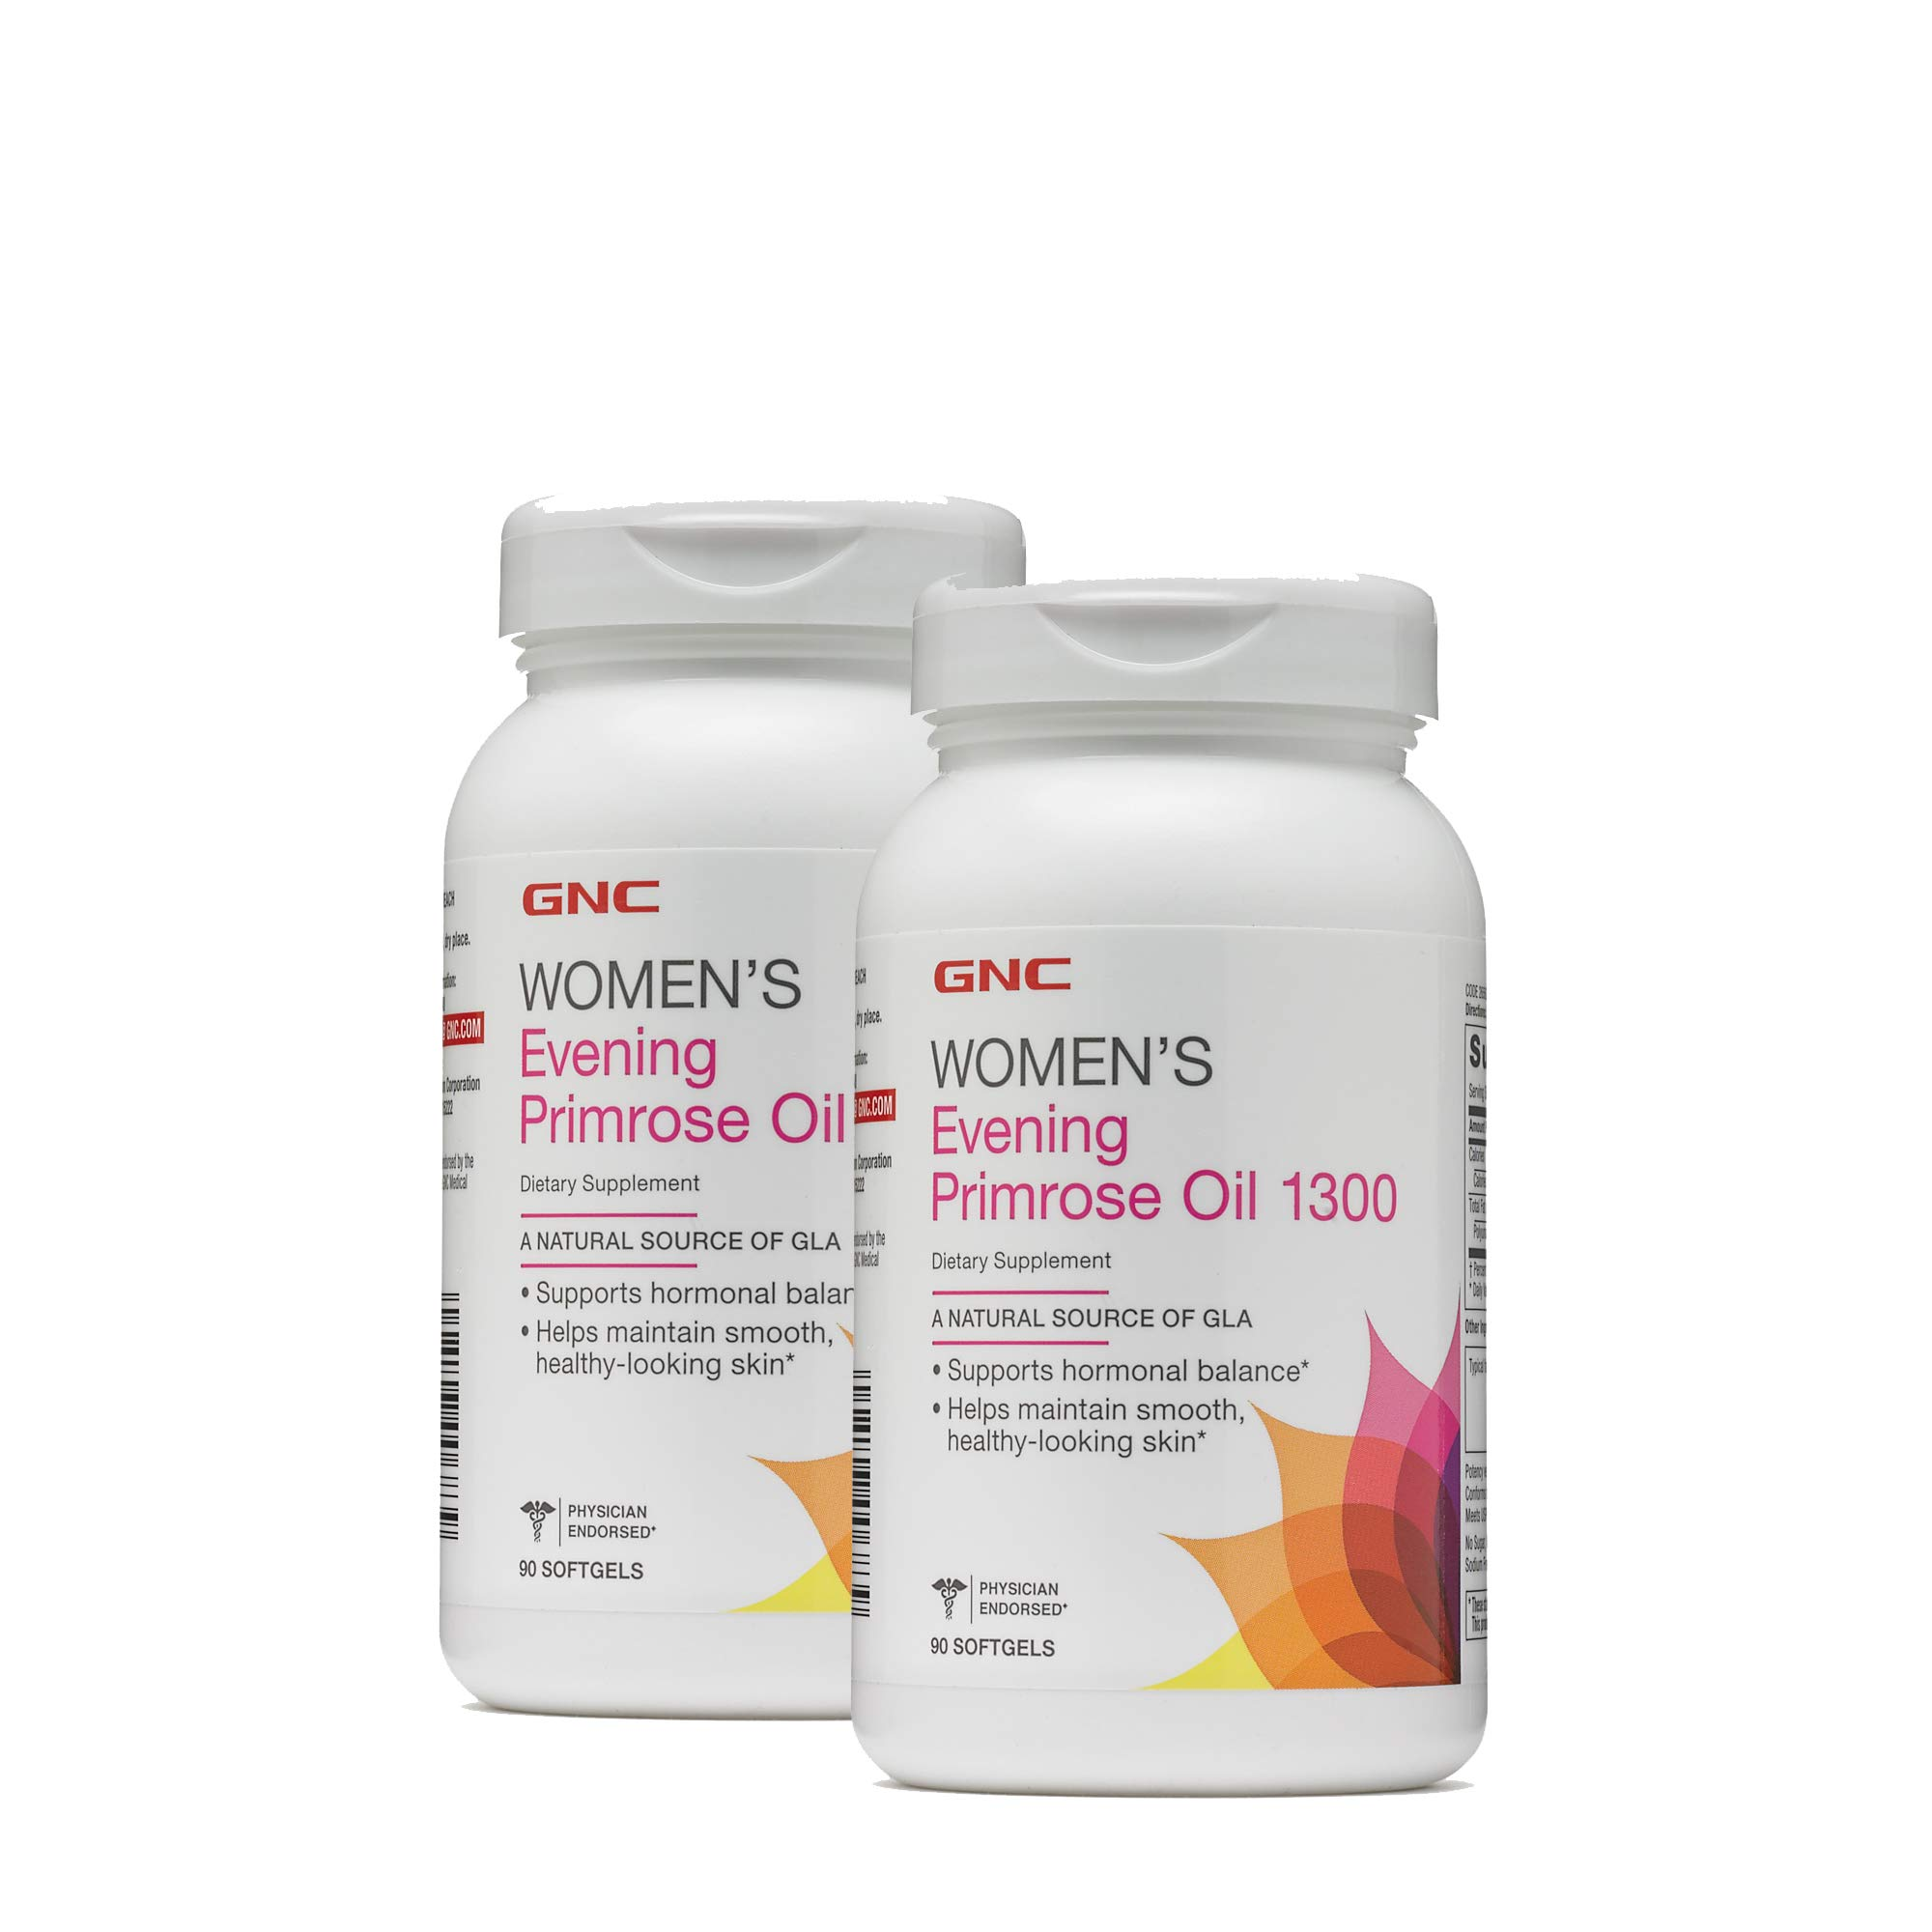 GNC Womens Evening Primrose Oil 1300 - Twin Pack